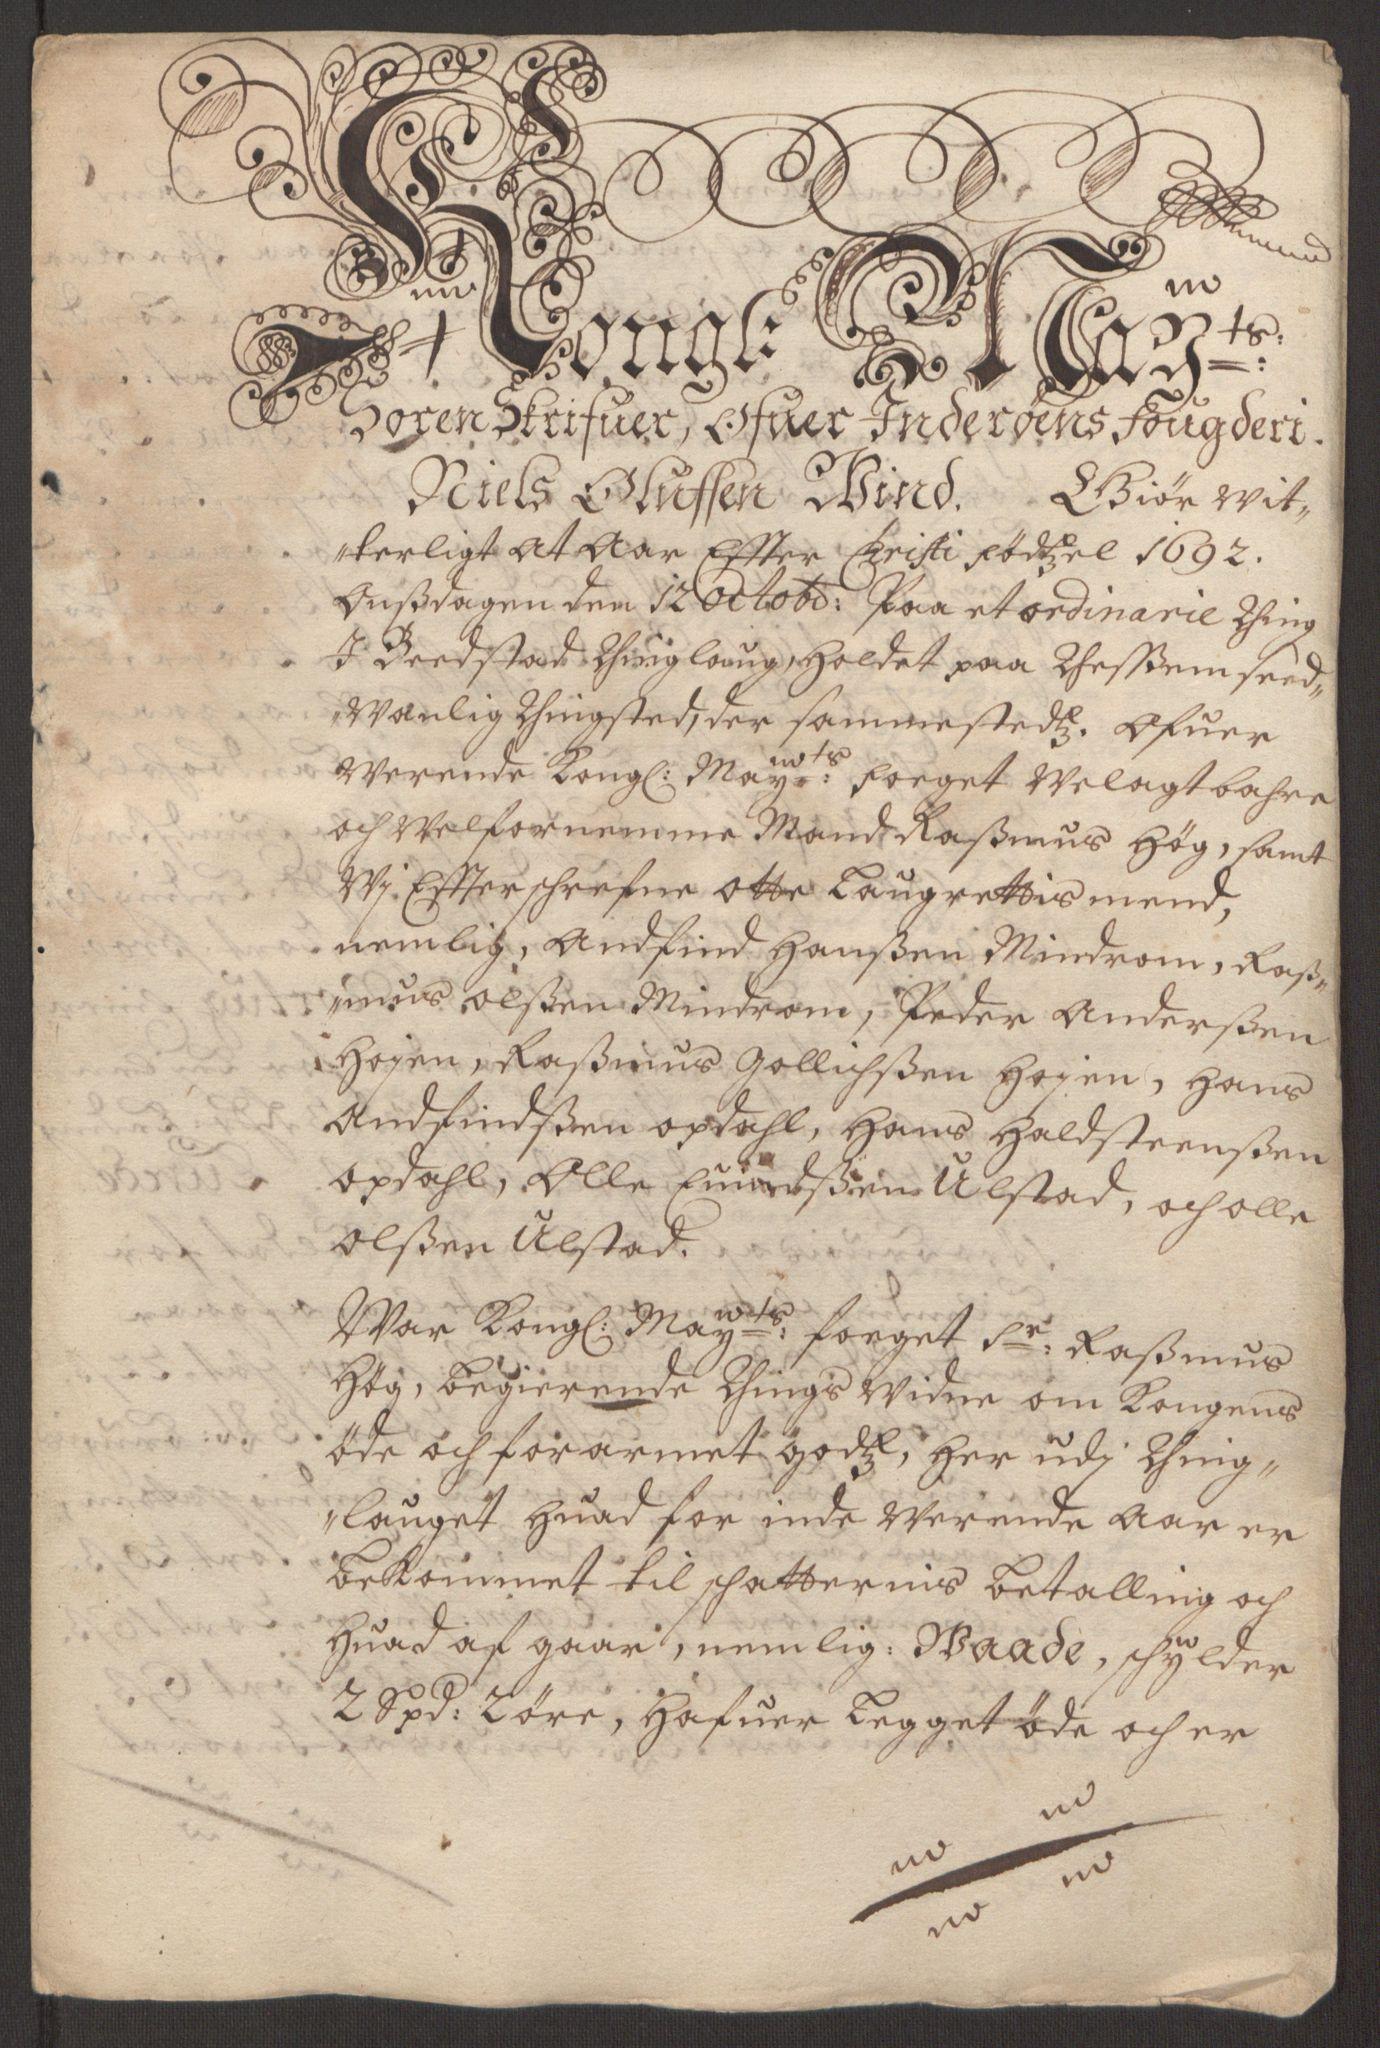 RA, Rentekammeret inntil 1814, Reviderte regnskaper, Fogderegnskap, R63/L4308: Fogderegnskap Inderøy, 1692-1694, s. 231